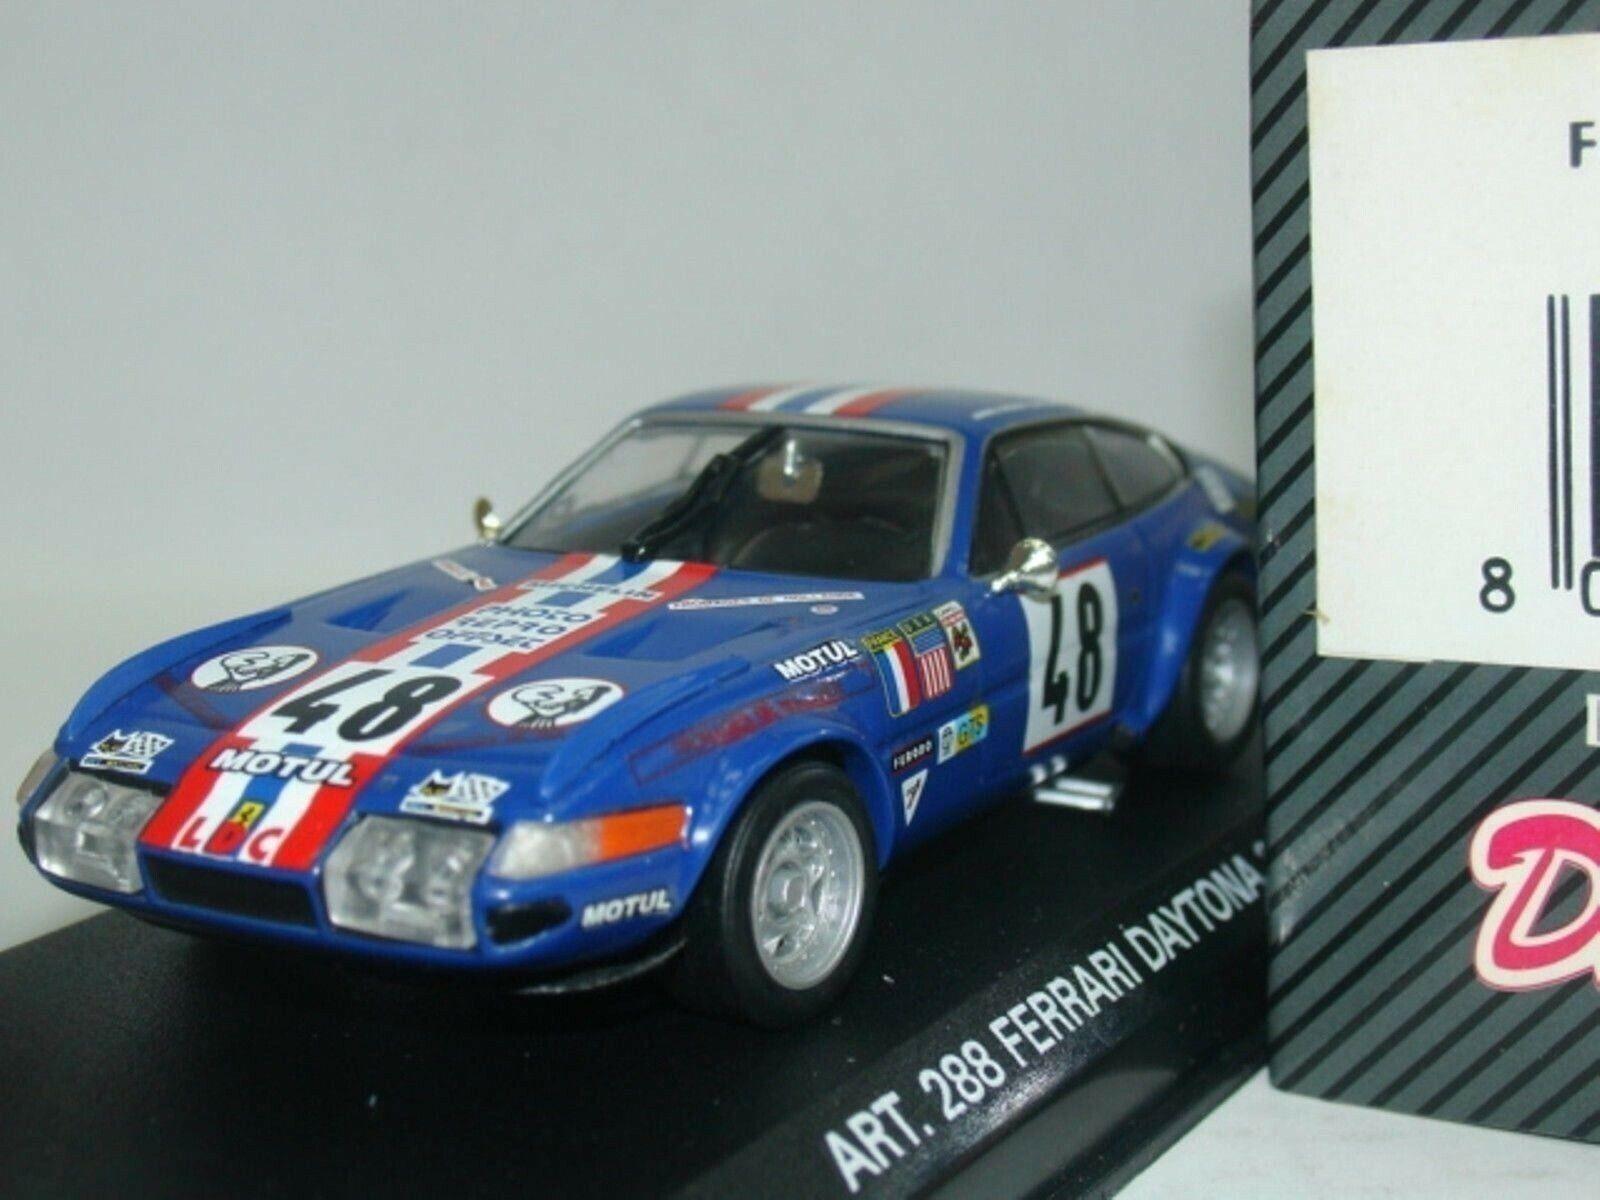 Wow extrêmement rare FERRARI 365 GTB 4 Daytona  48 Le Mans 1975 1 43 détail-Spark